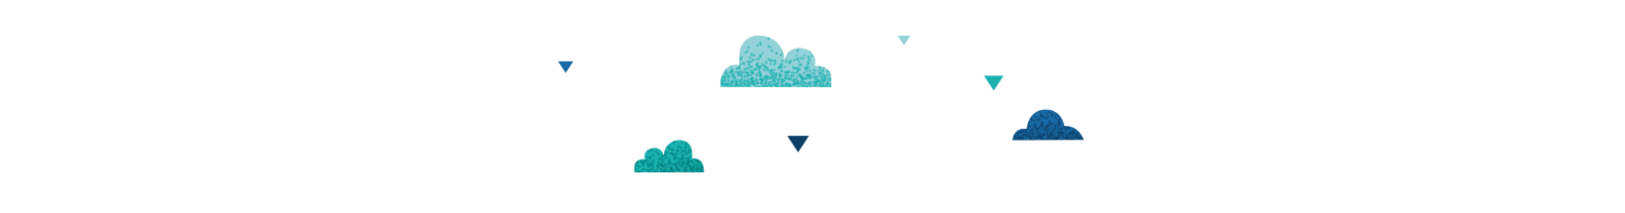 KEOBILL_nuages